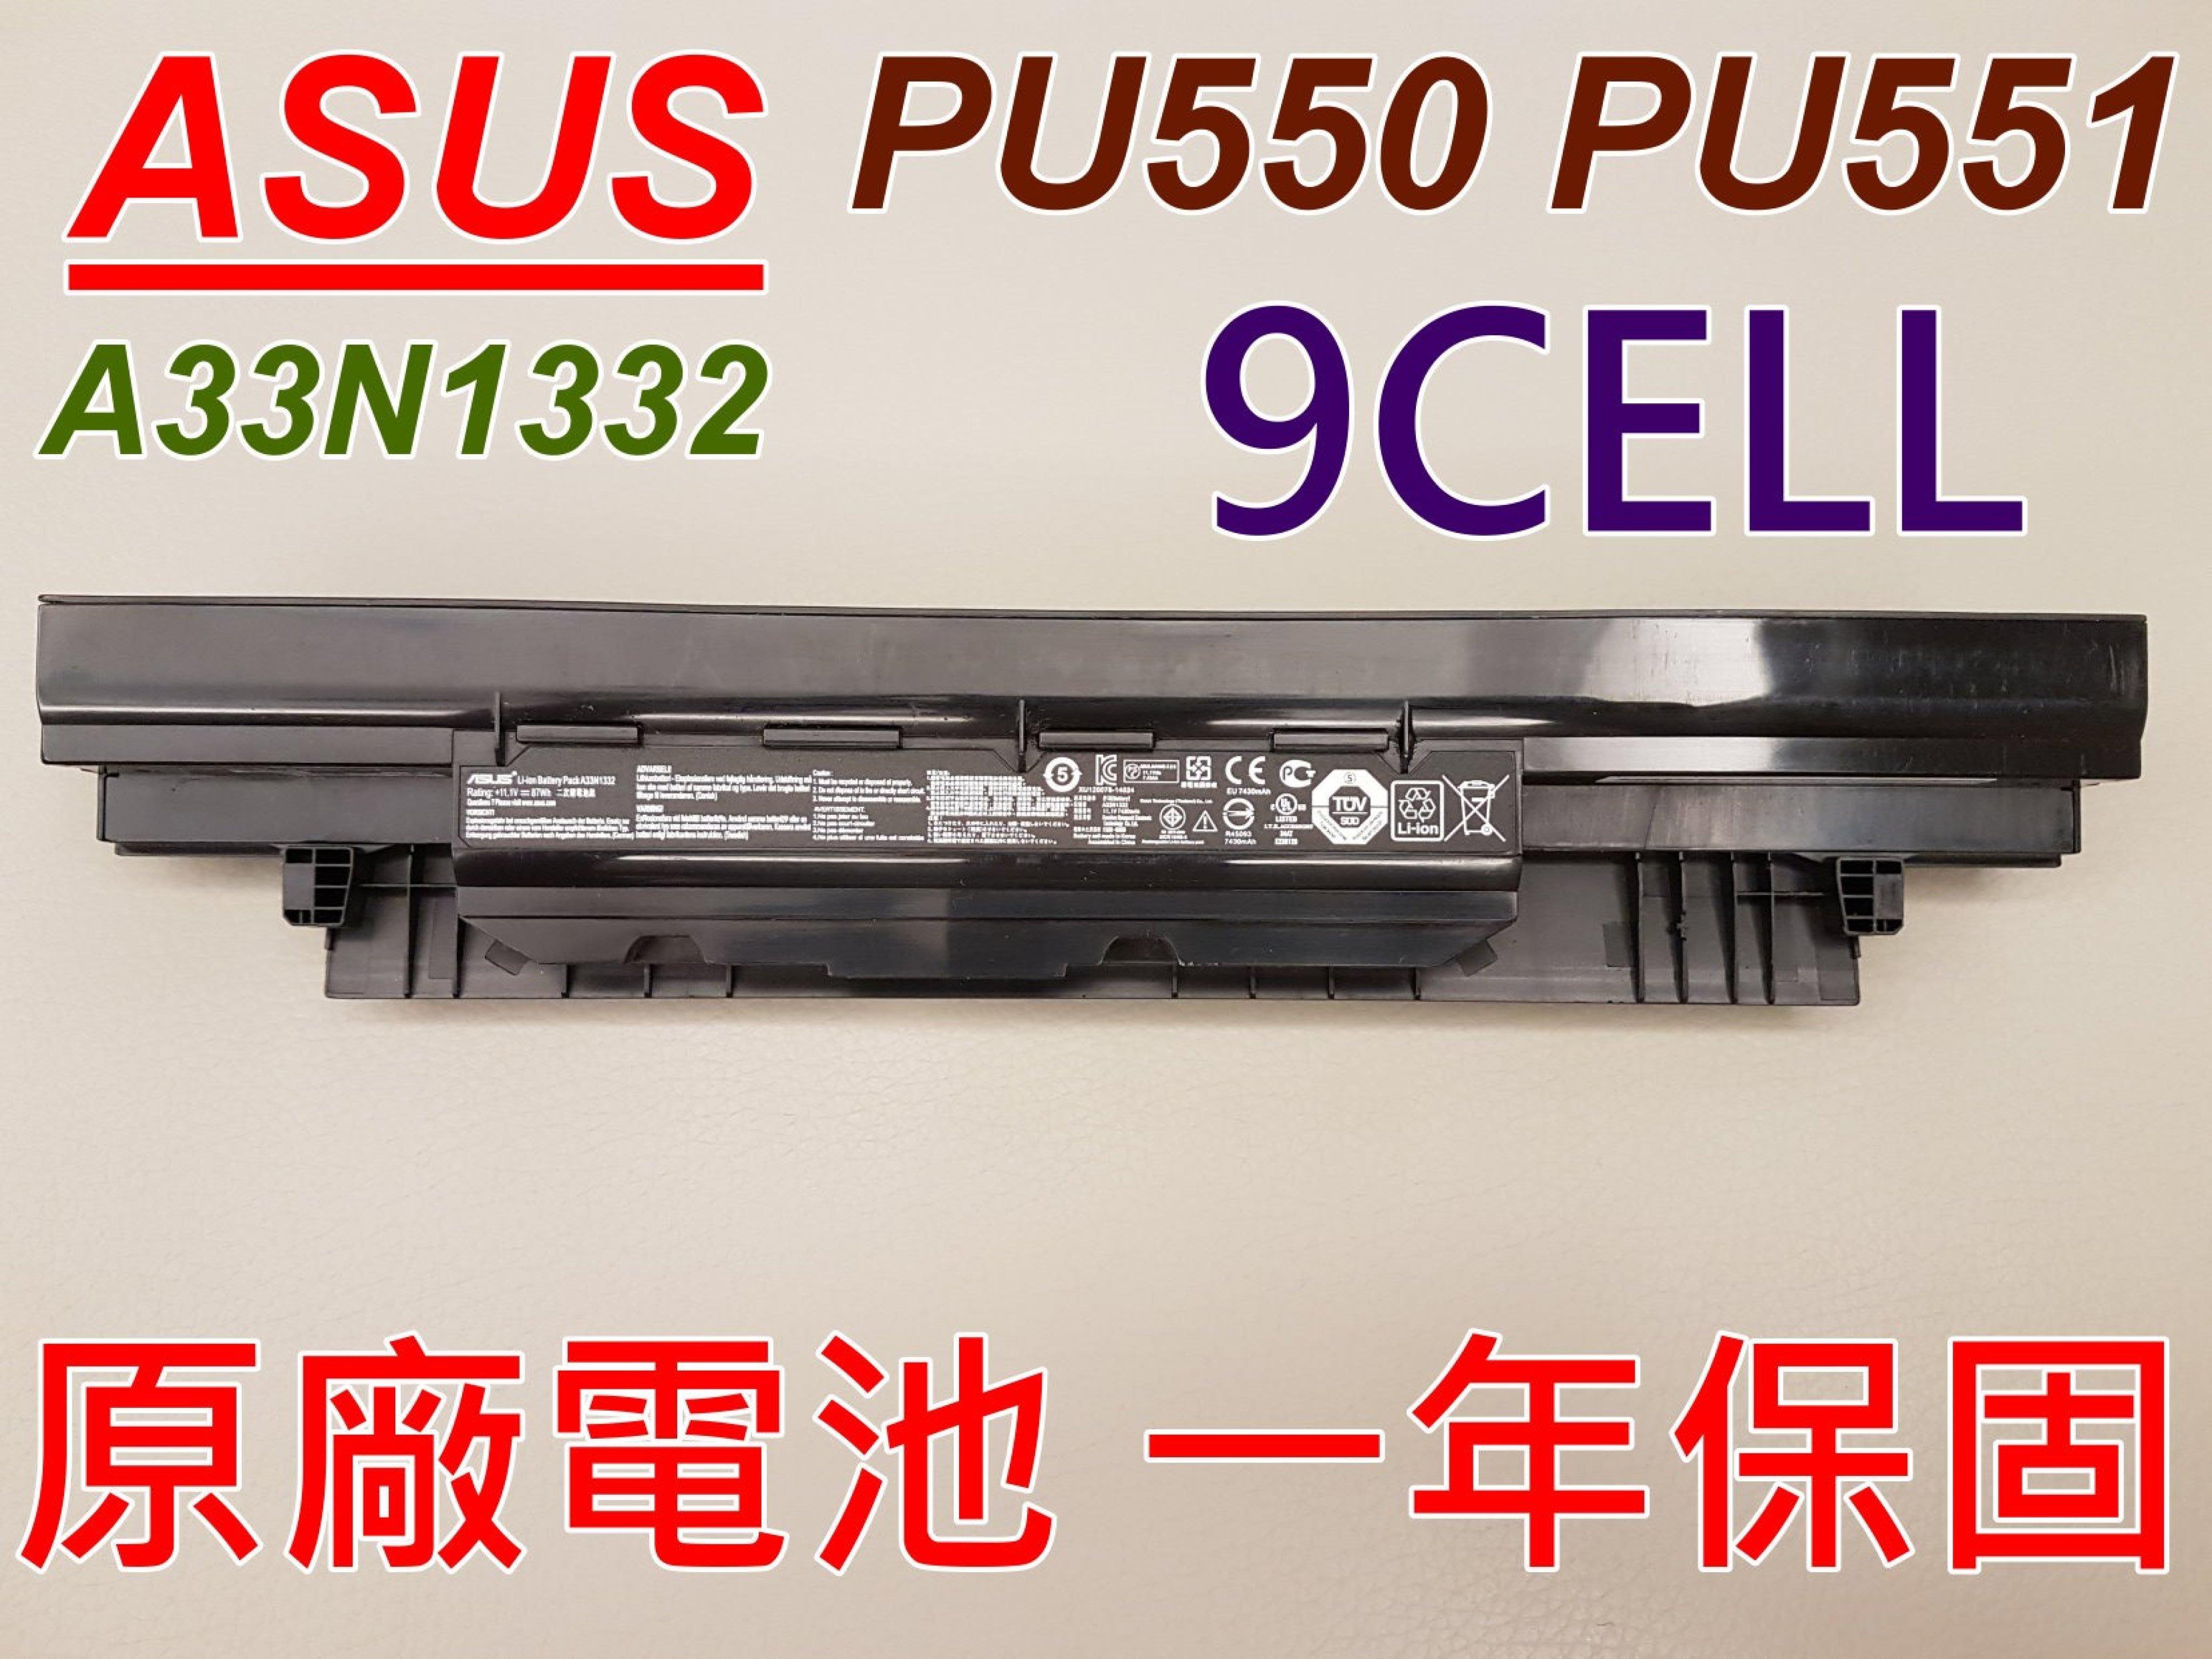 9CELL ASUS 華碩 A33N1332 原廠電池 450 450CA 450CD 450V 450VB